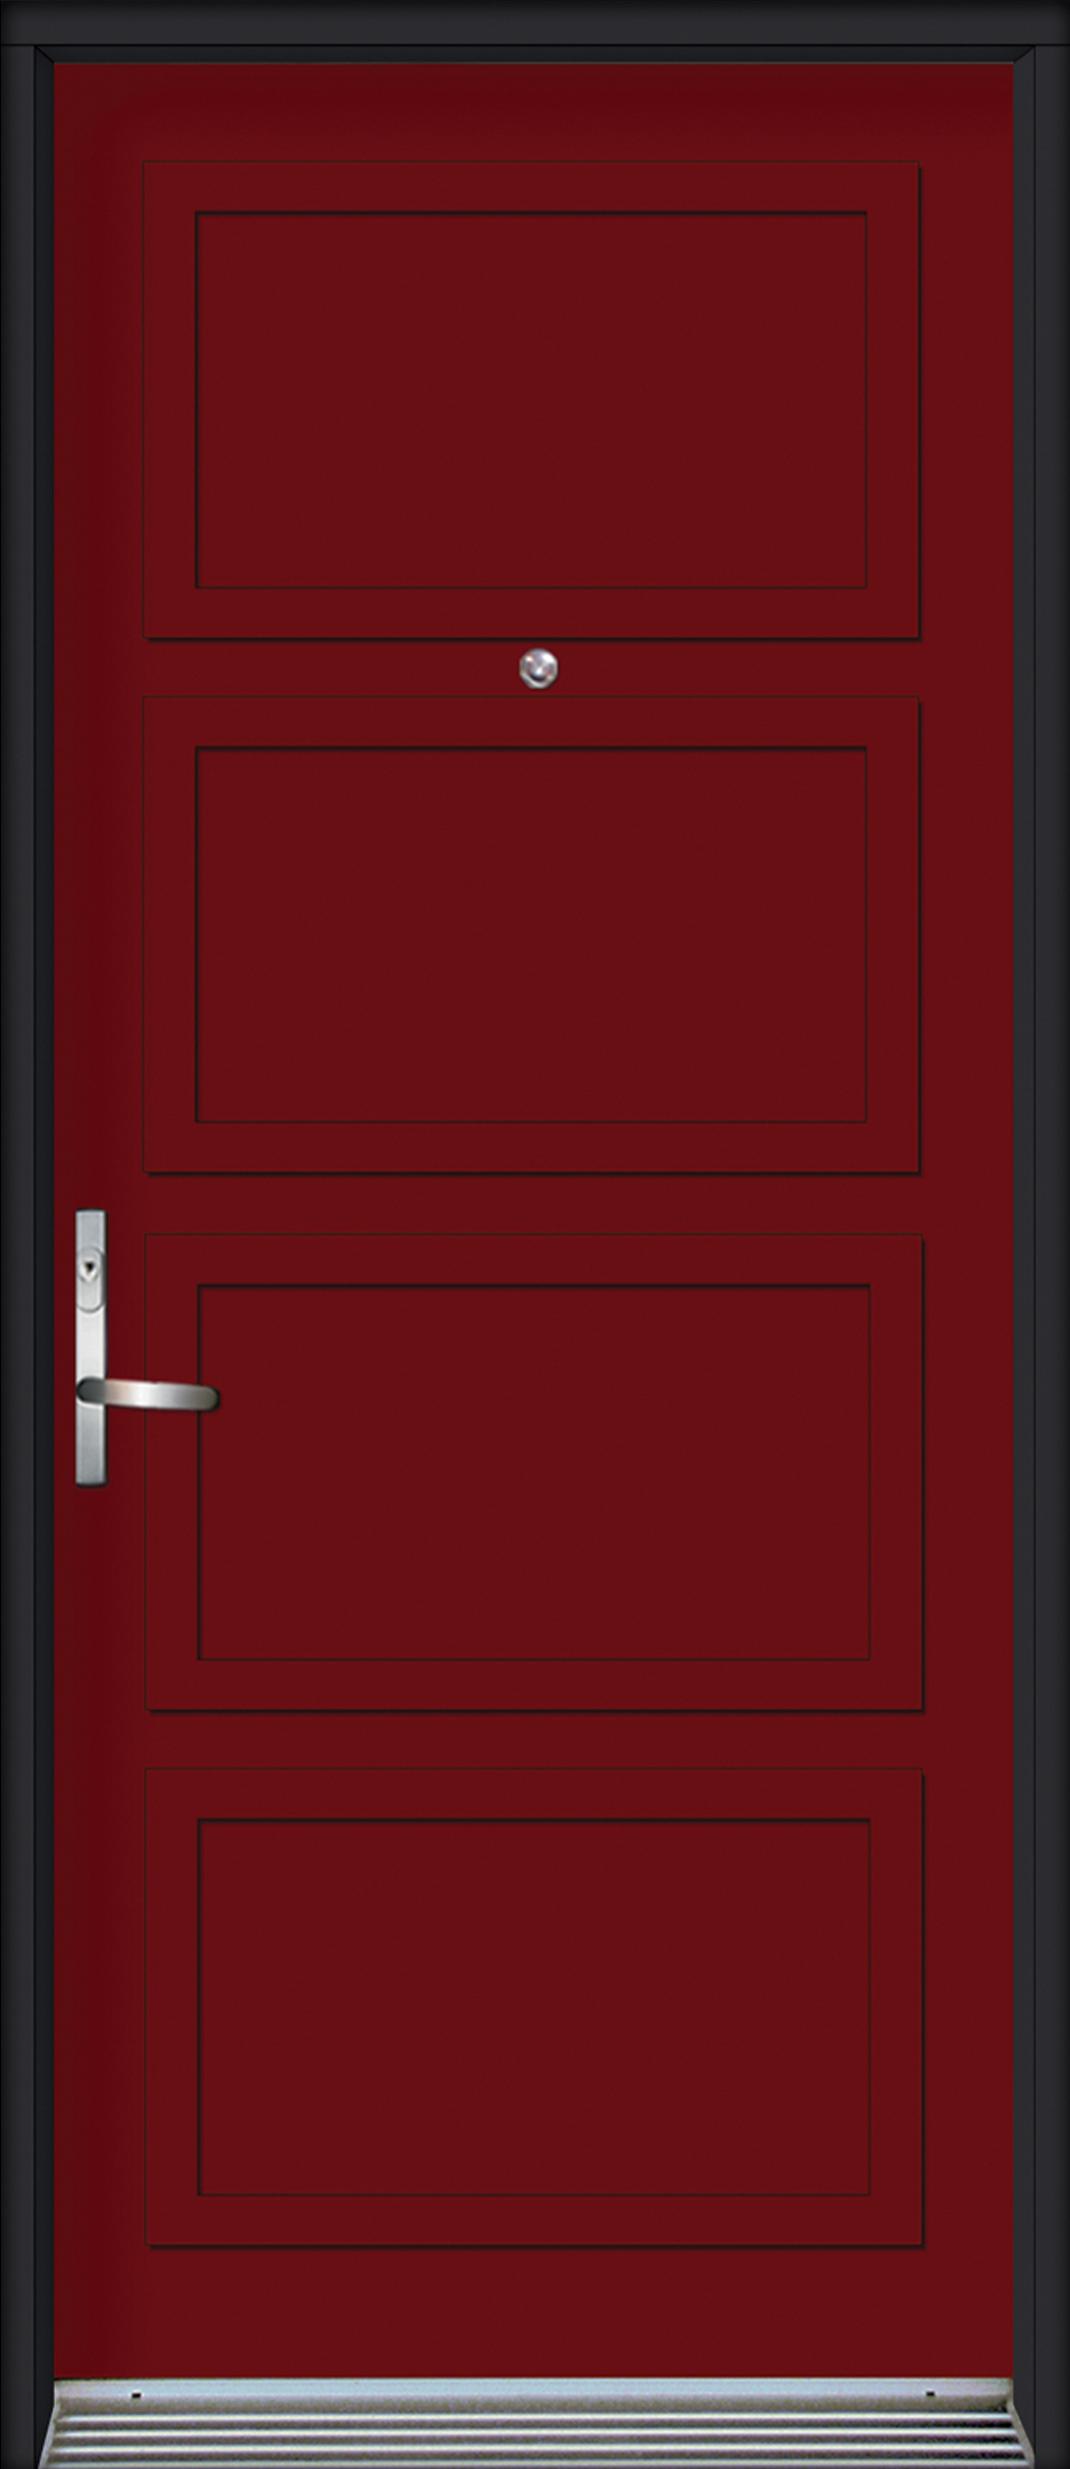 Porte contemporaine gamma 1 portatec for Porte contemporaine interieur